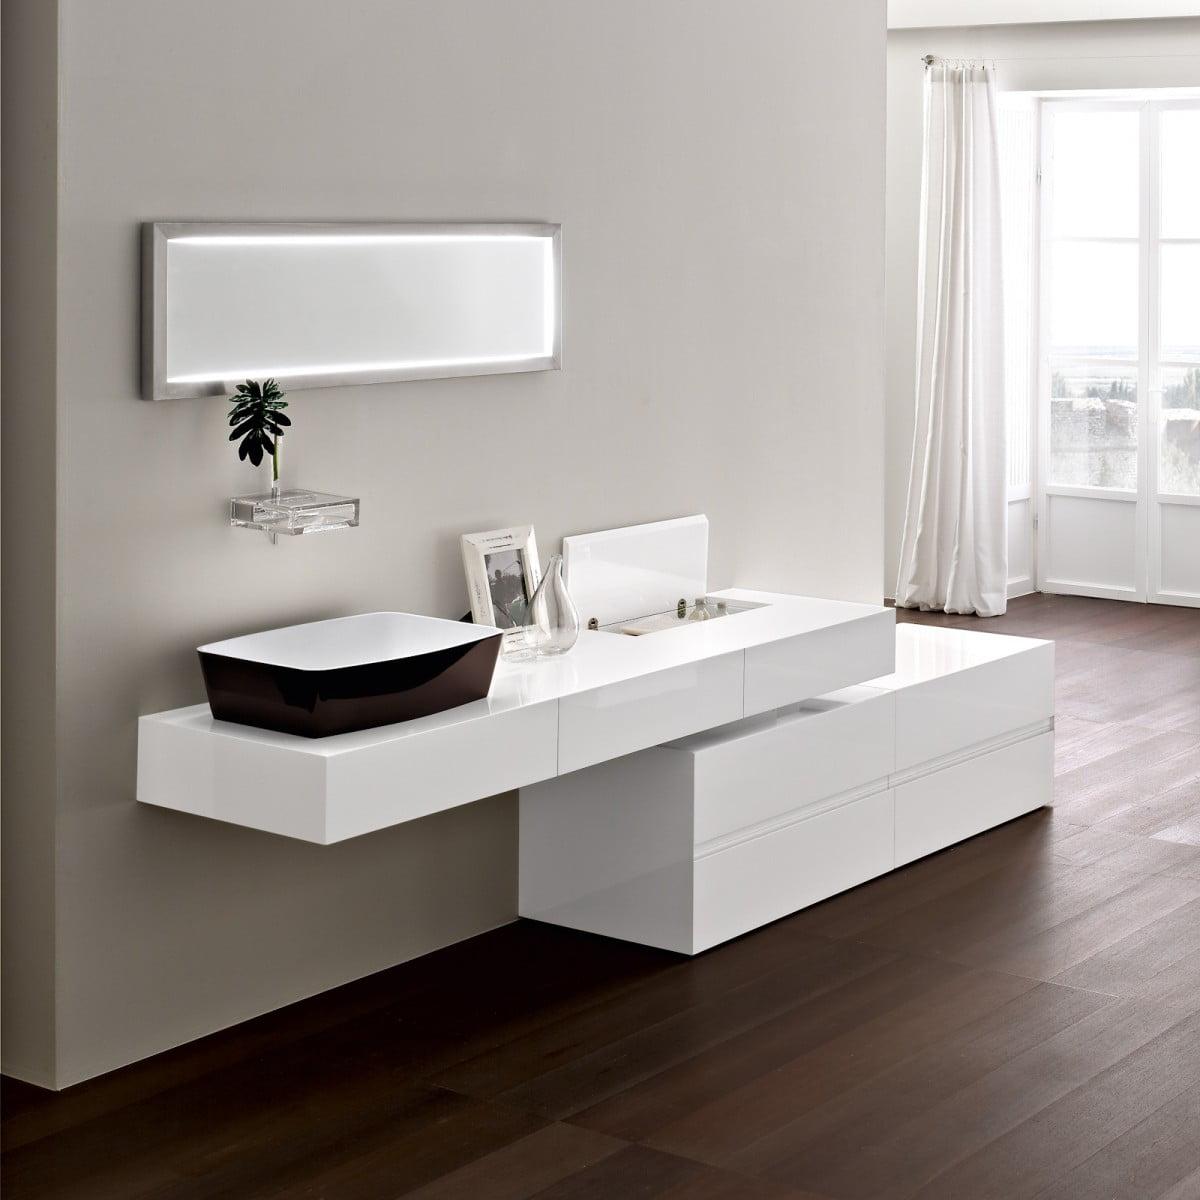 Muebles Para Ba Os Constructora Paramount # Muebles Ultramodernos